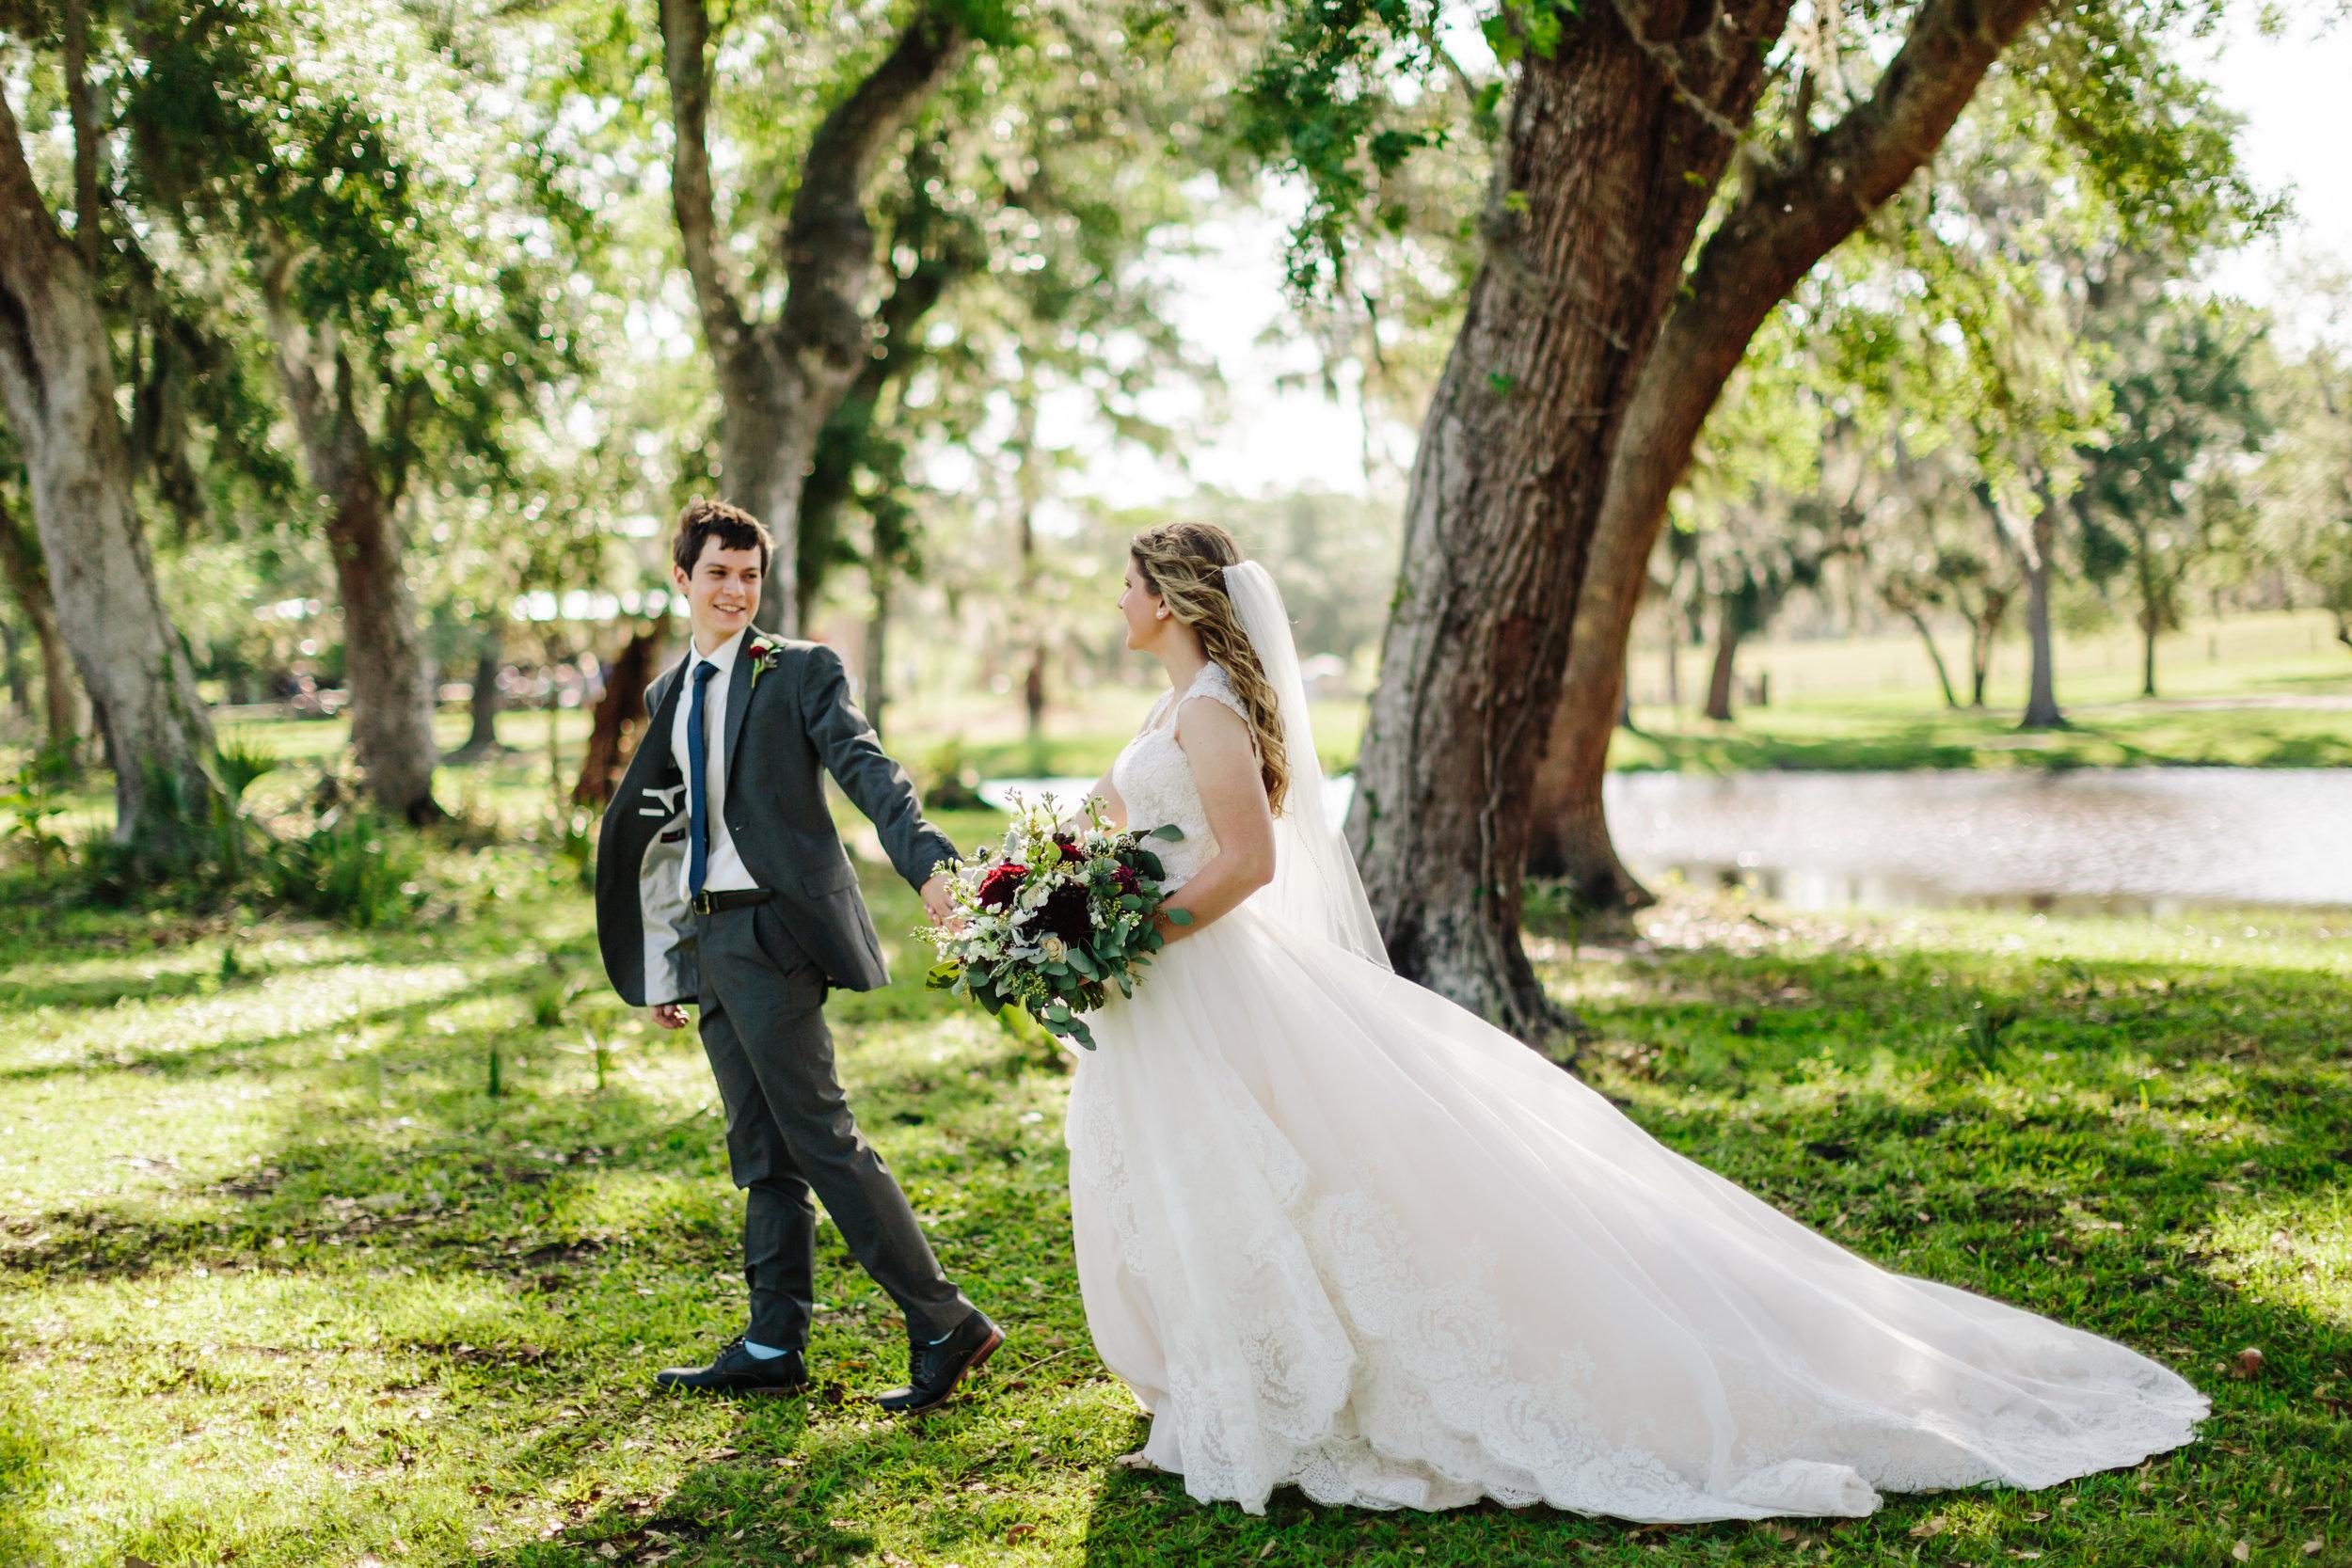 2018.04.14 Zak and Jamisyn Unrue Black Willow Barn Wedding Finals-575.jpg